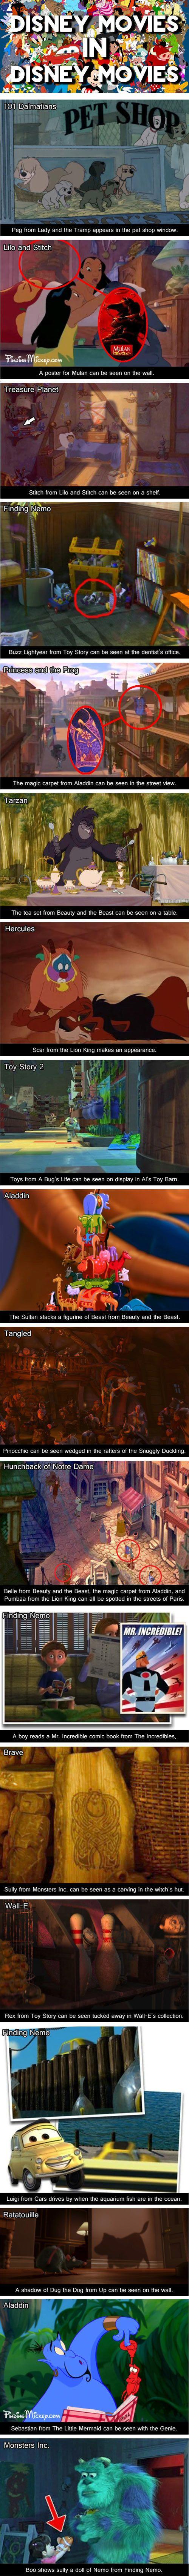 Disney Movies Inside Other Disney Movies...